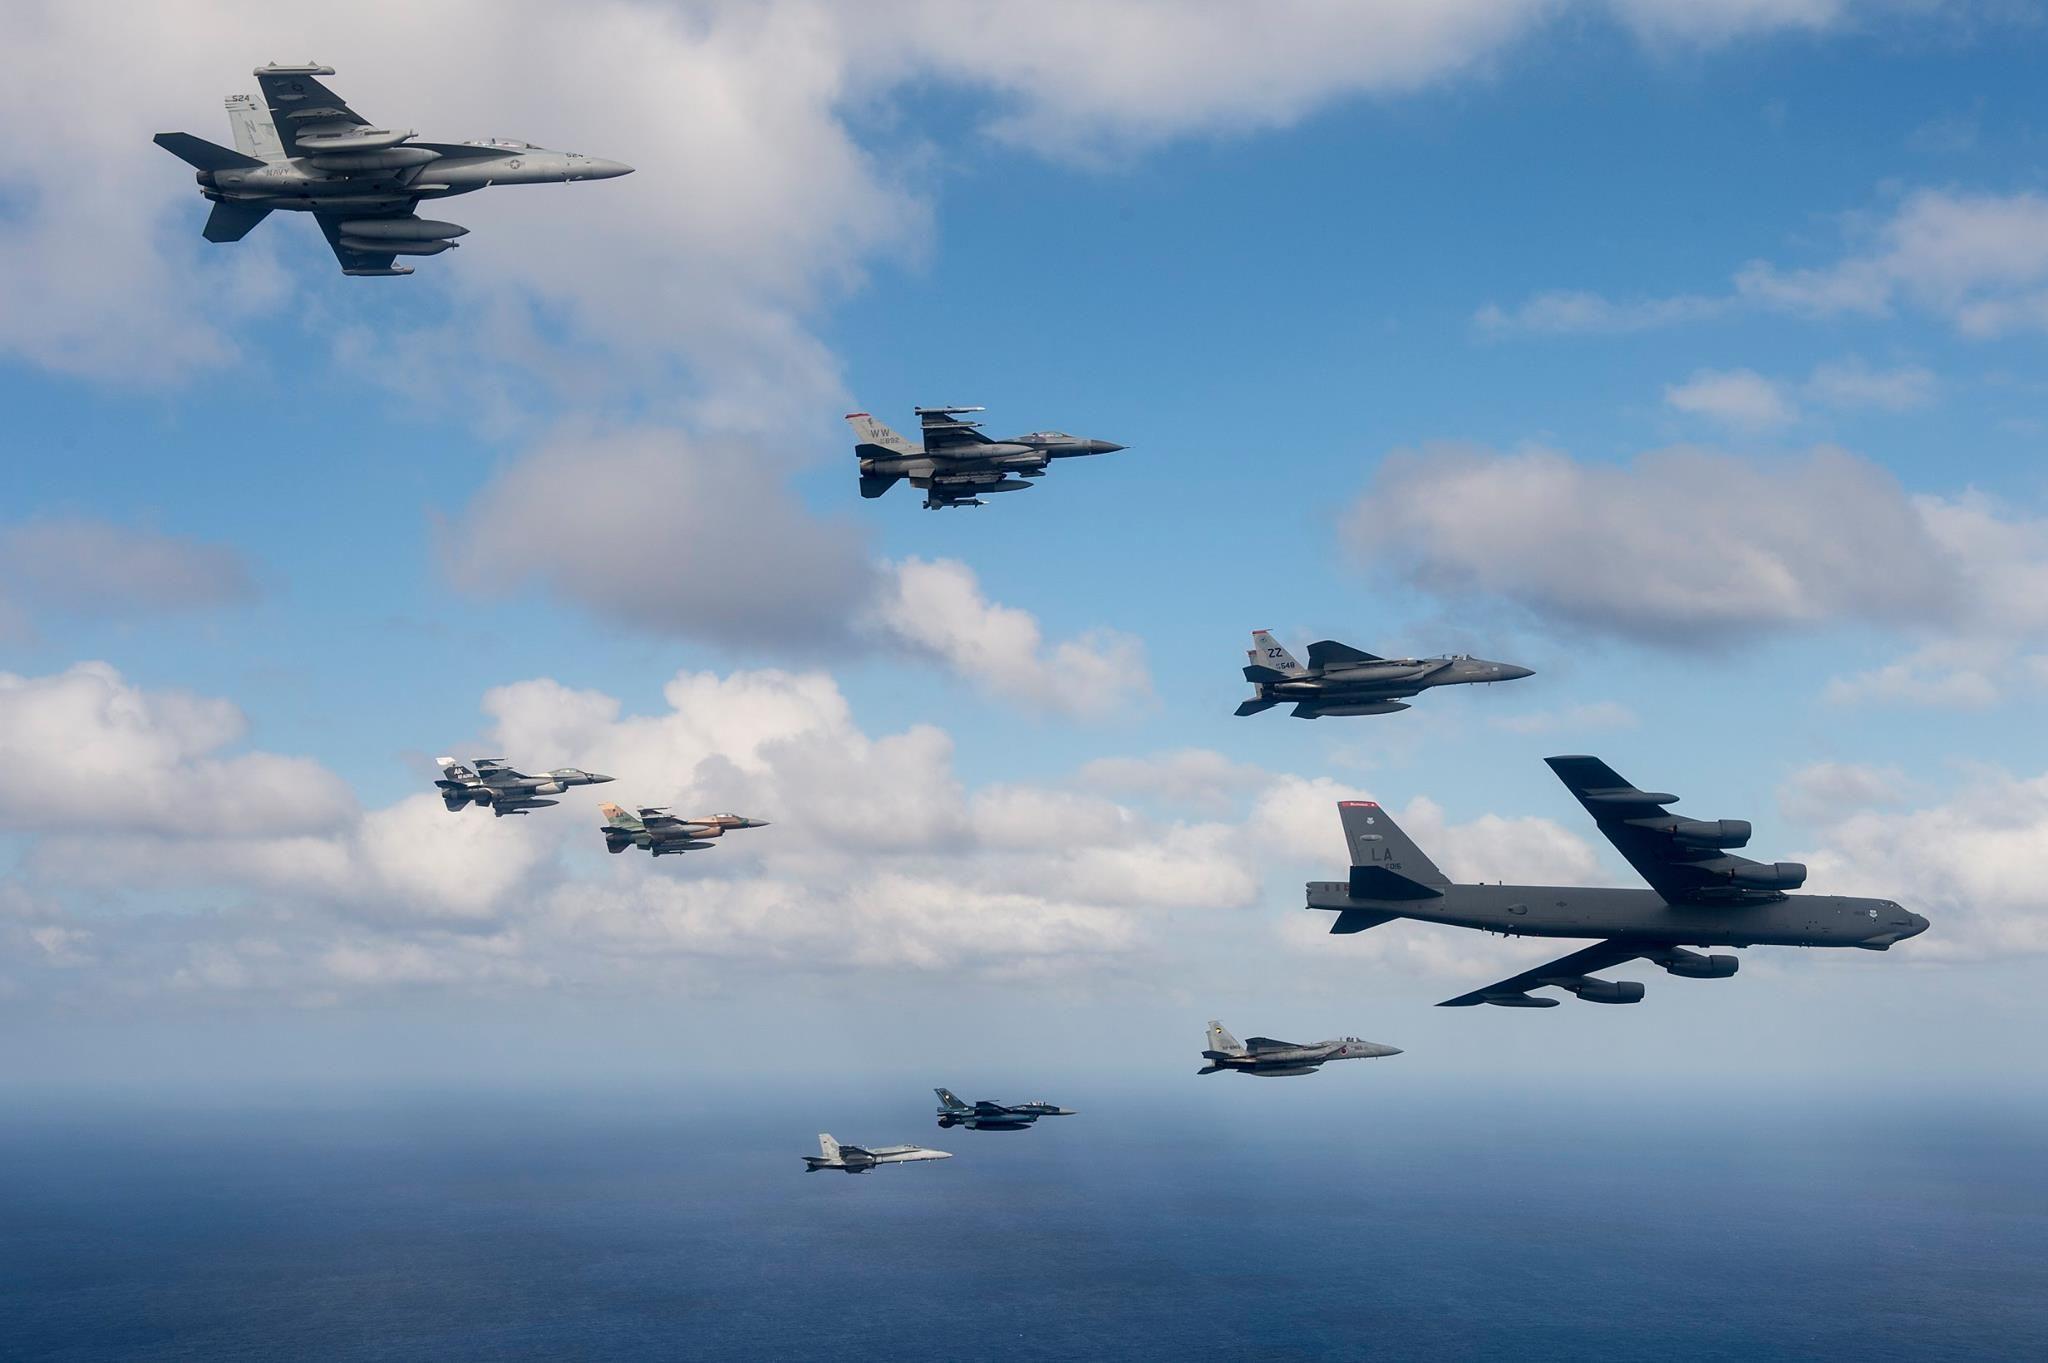 UnitedStates Military ACFilters